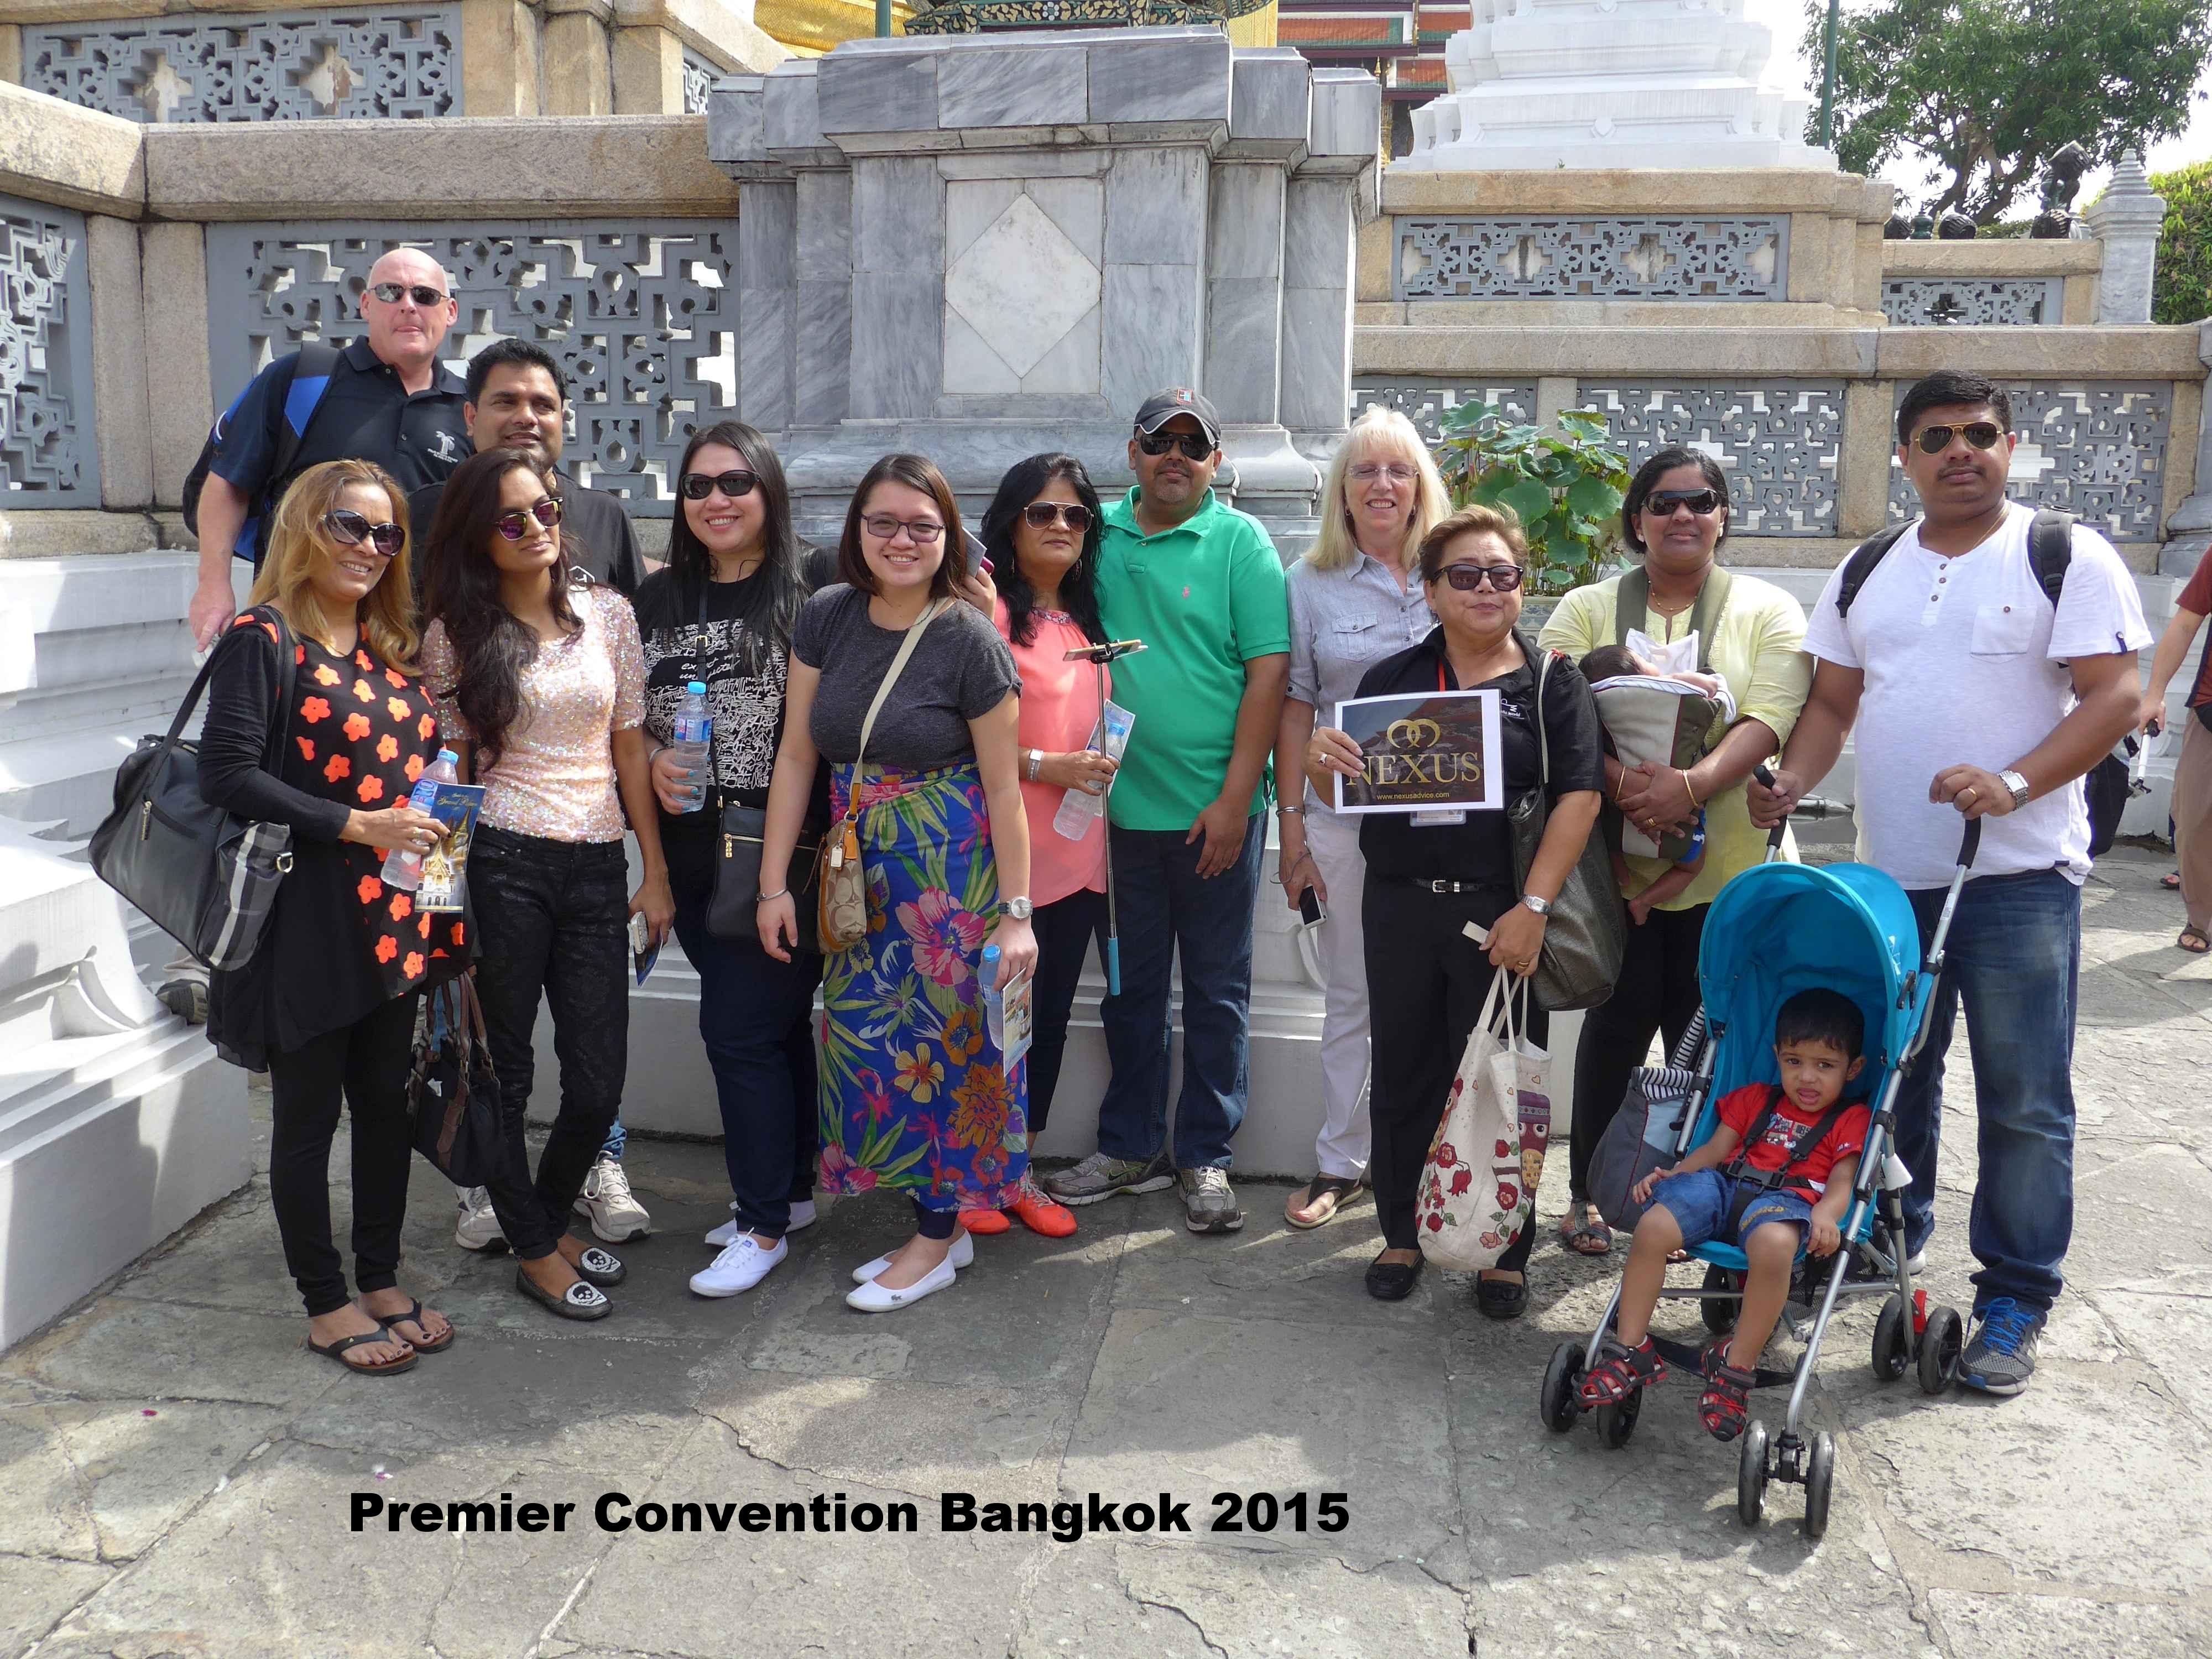 Premier Convention Bangkok 2015